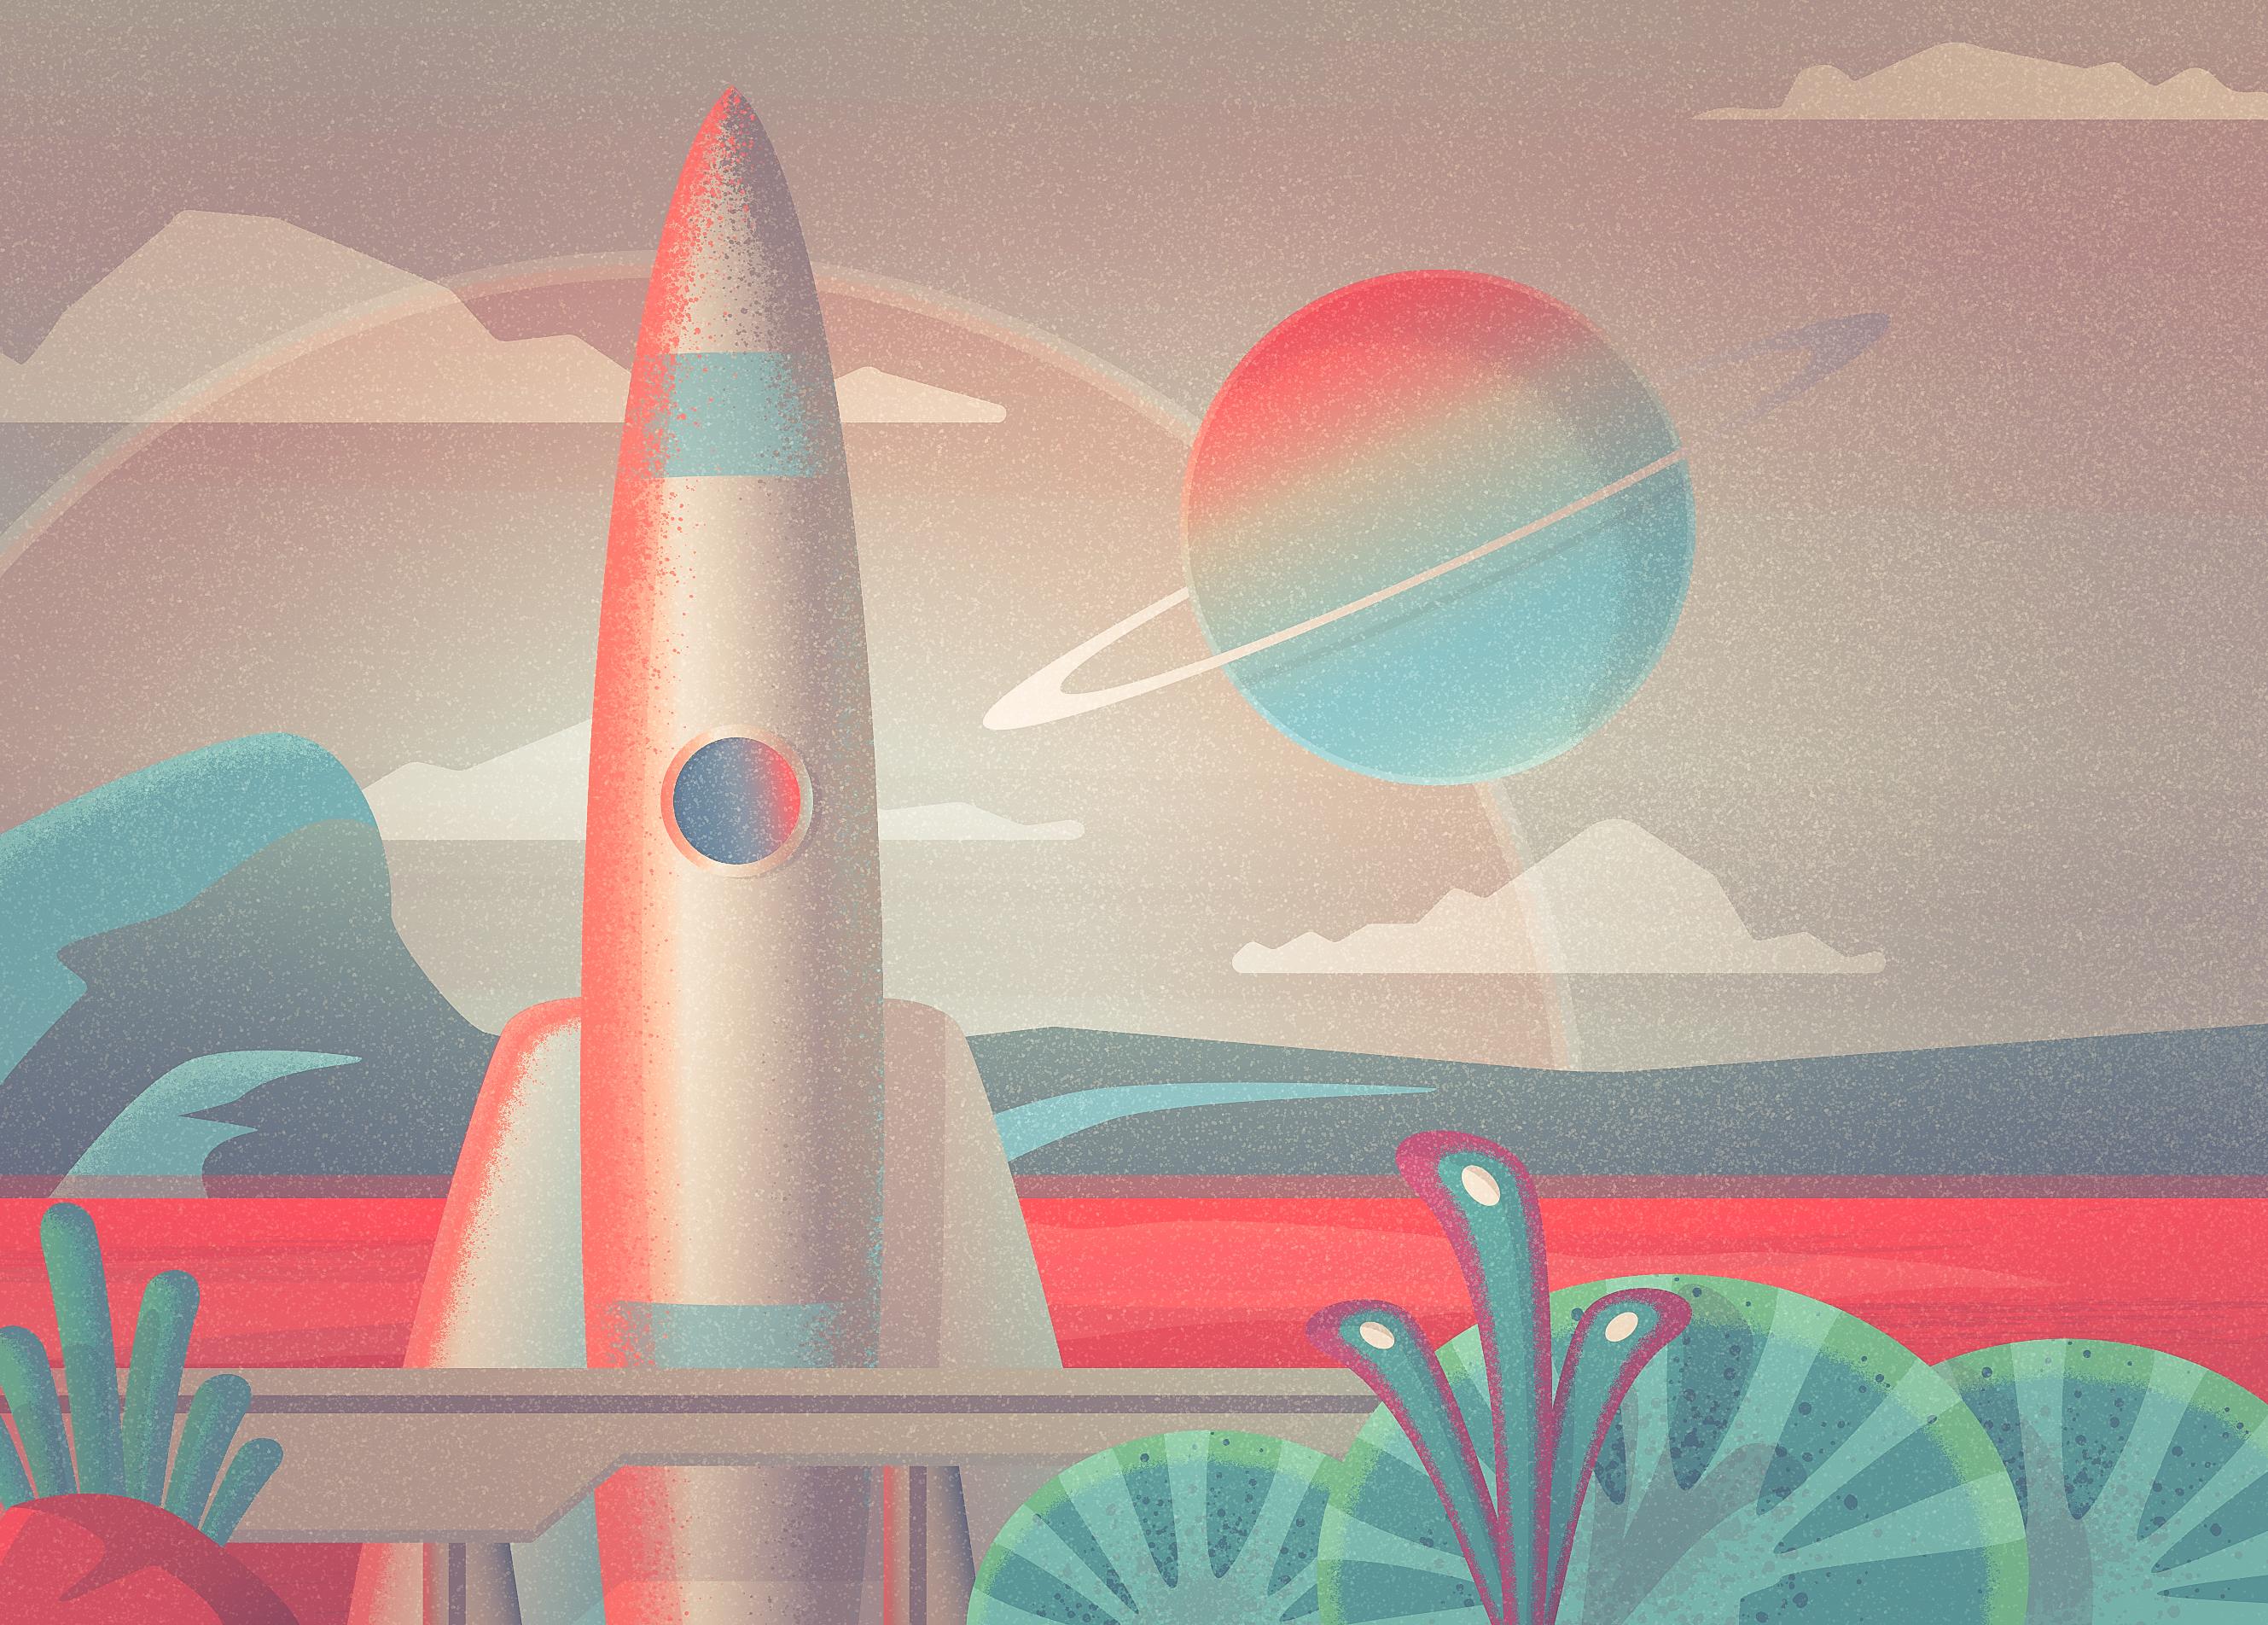 future rocket gif - HD1400×1003